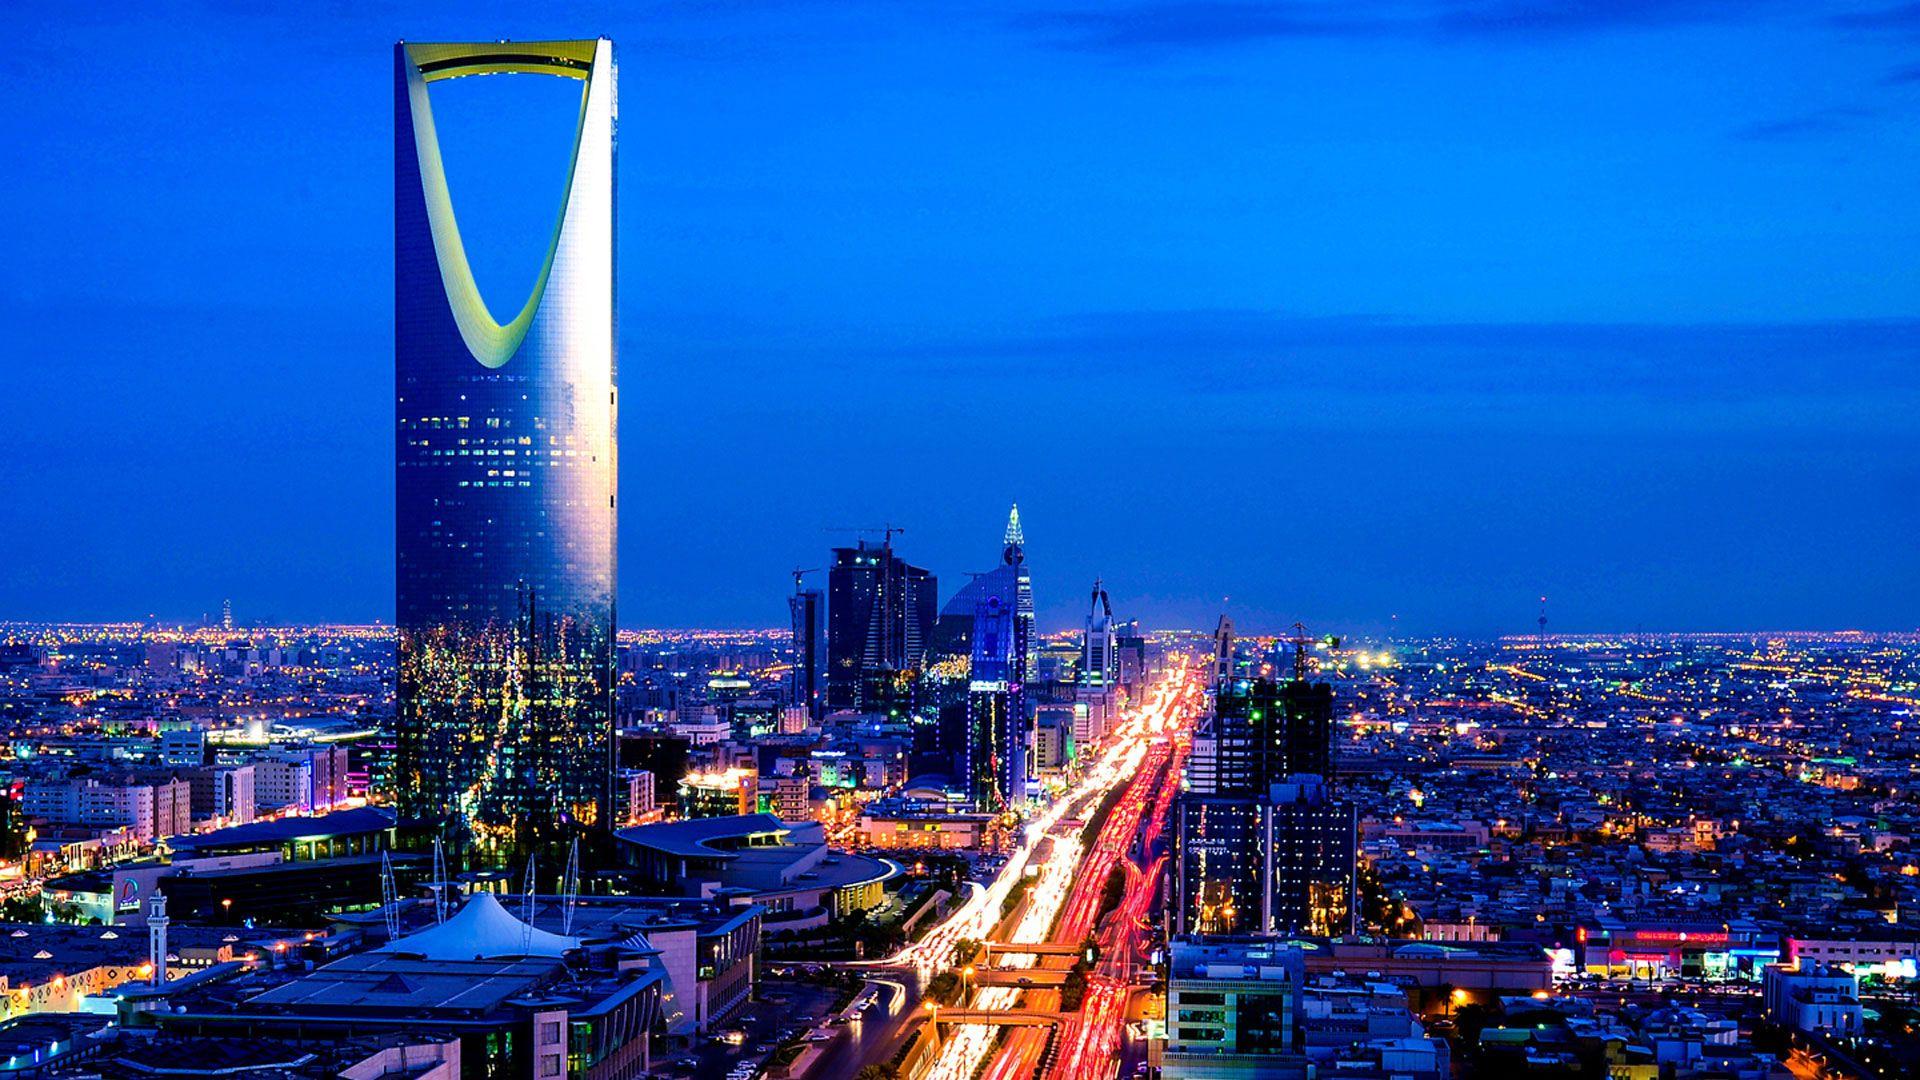 Jobs In Saudi Arabia Complete List Of Saudi Arabia Companies We Have Created A List Fo Saudi Arabia Companies In The Middle Eas Dubai City Riyadh Saudi Arabia